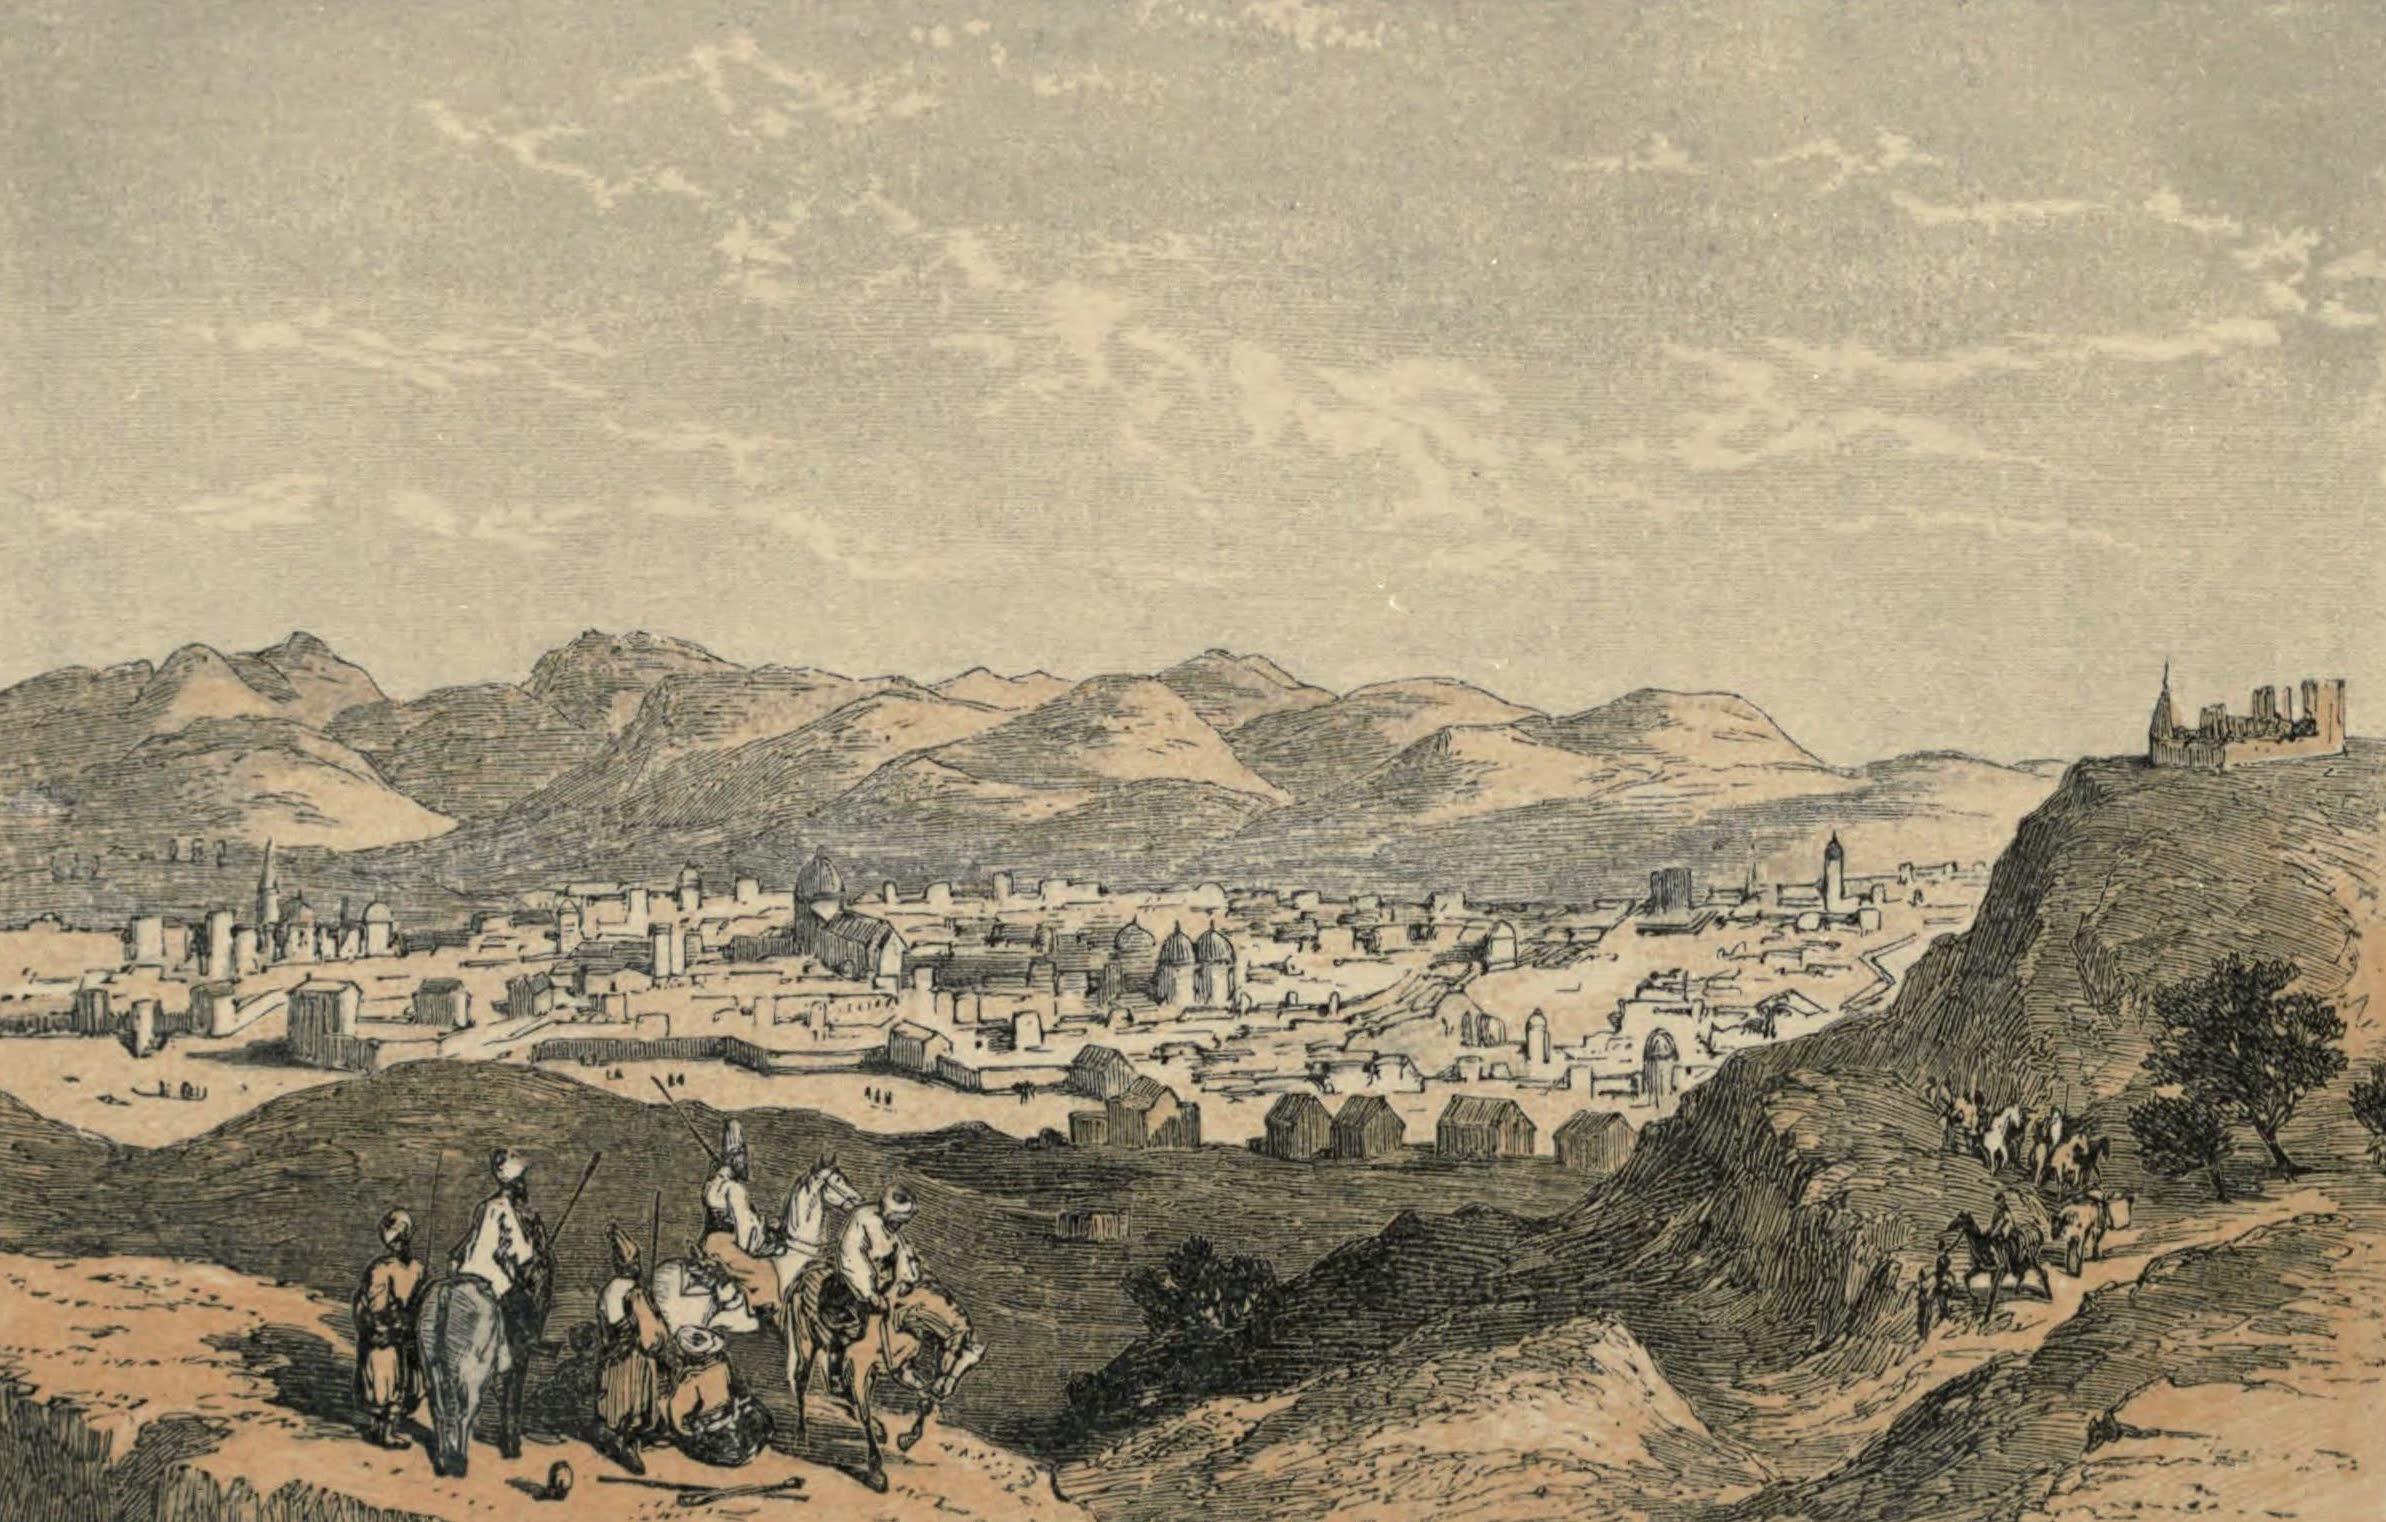 A Woman's Journey Round the World - Tebris (1852)